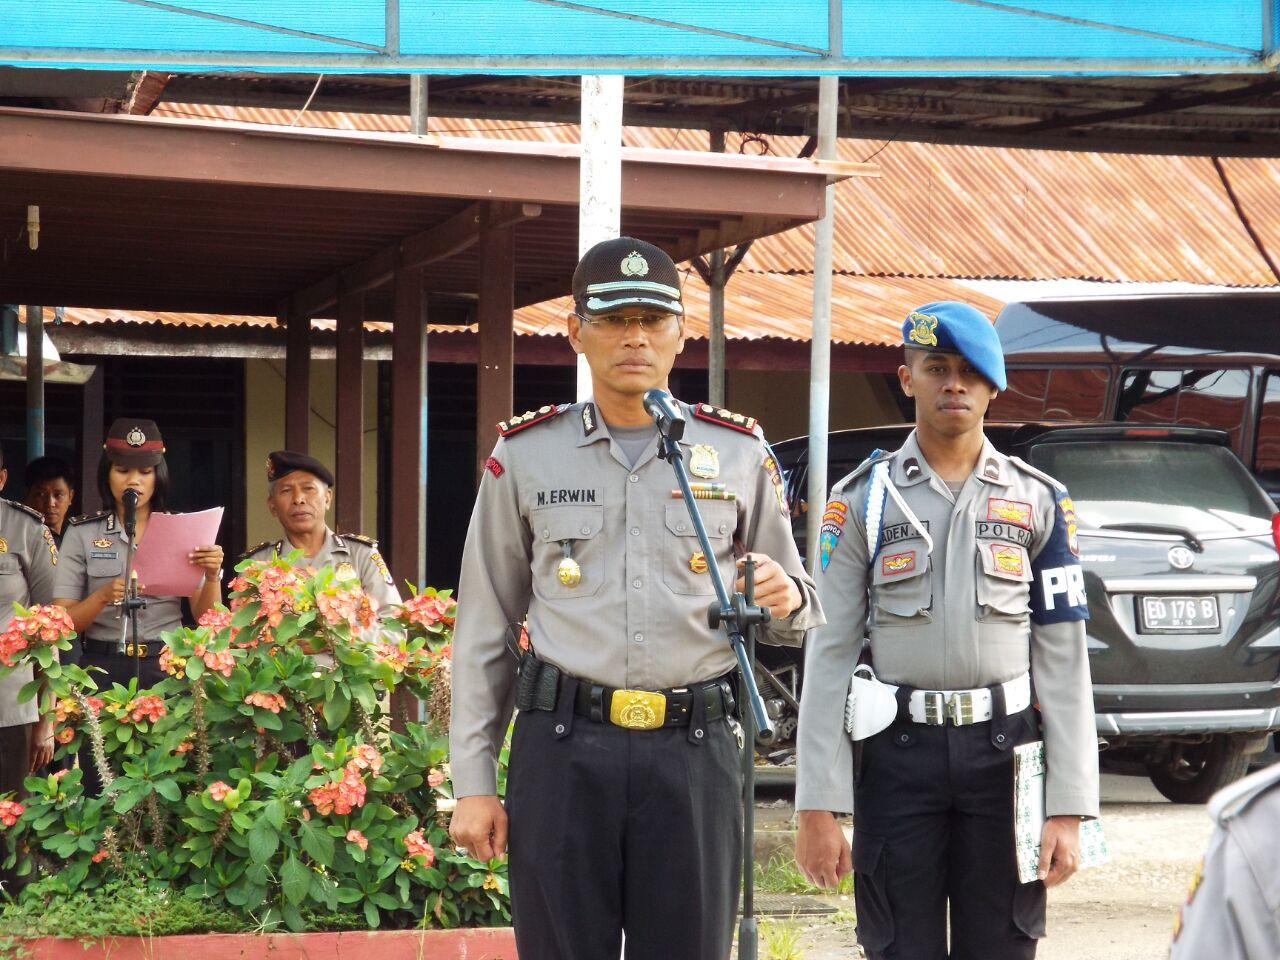 Bapak Kapolres Sumba Barat AKBP MUHAMAD ERWIN Turunkan 216 Personil Terkait Pengamanan Jelang Perayaan Natal Dan Tahun Baru 2017